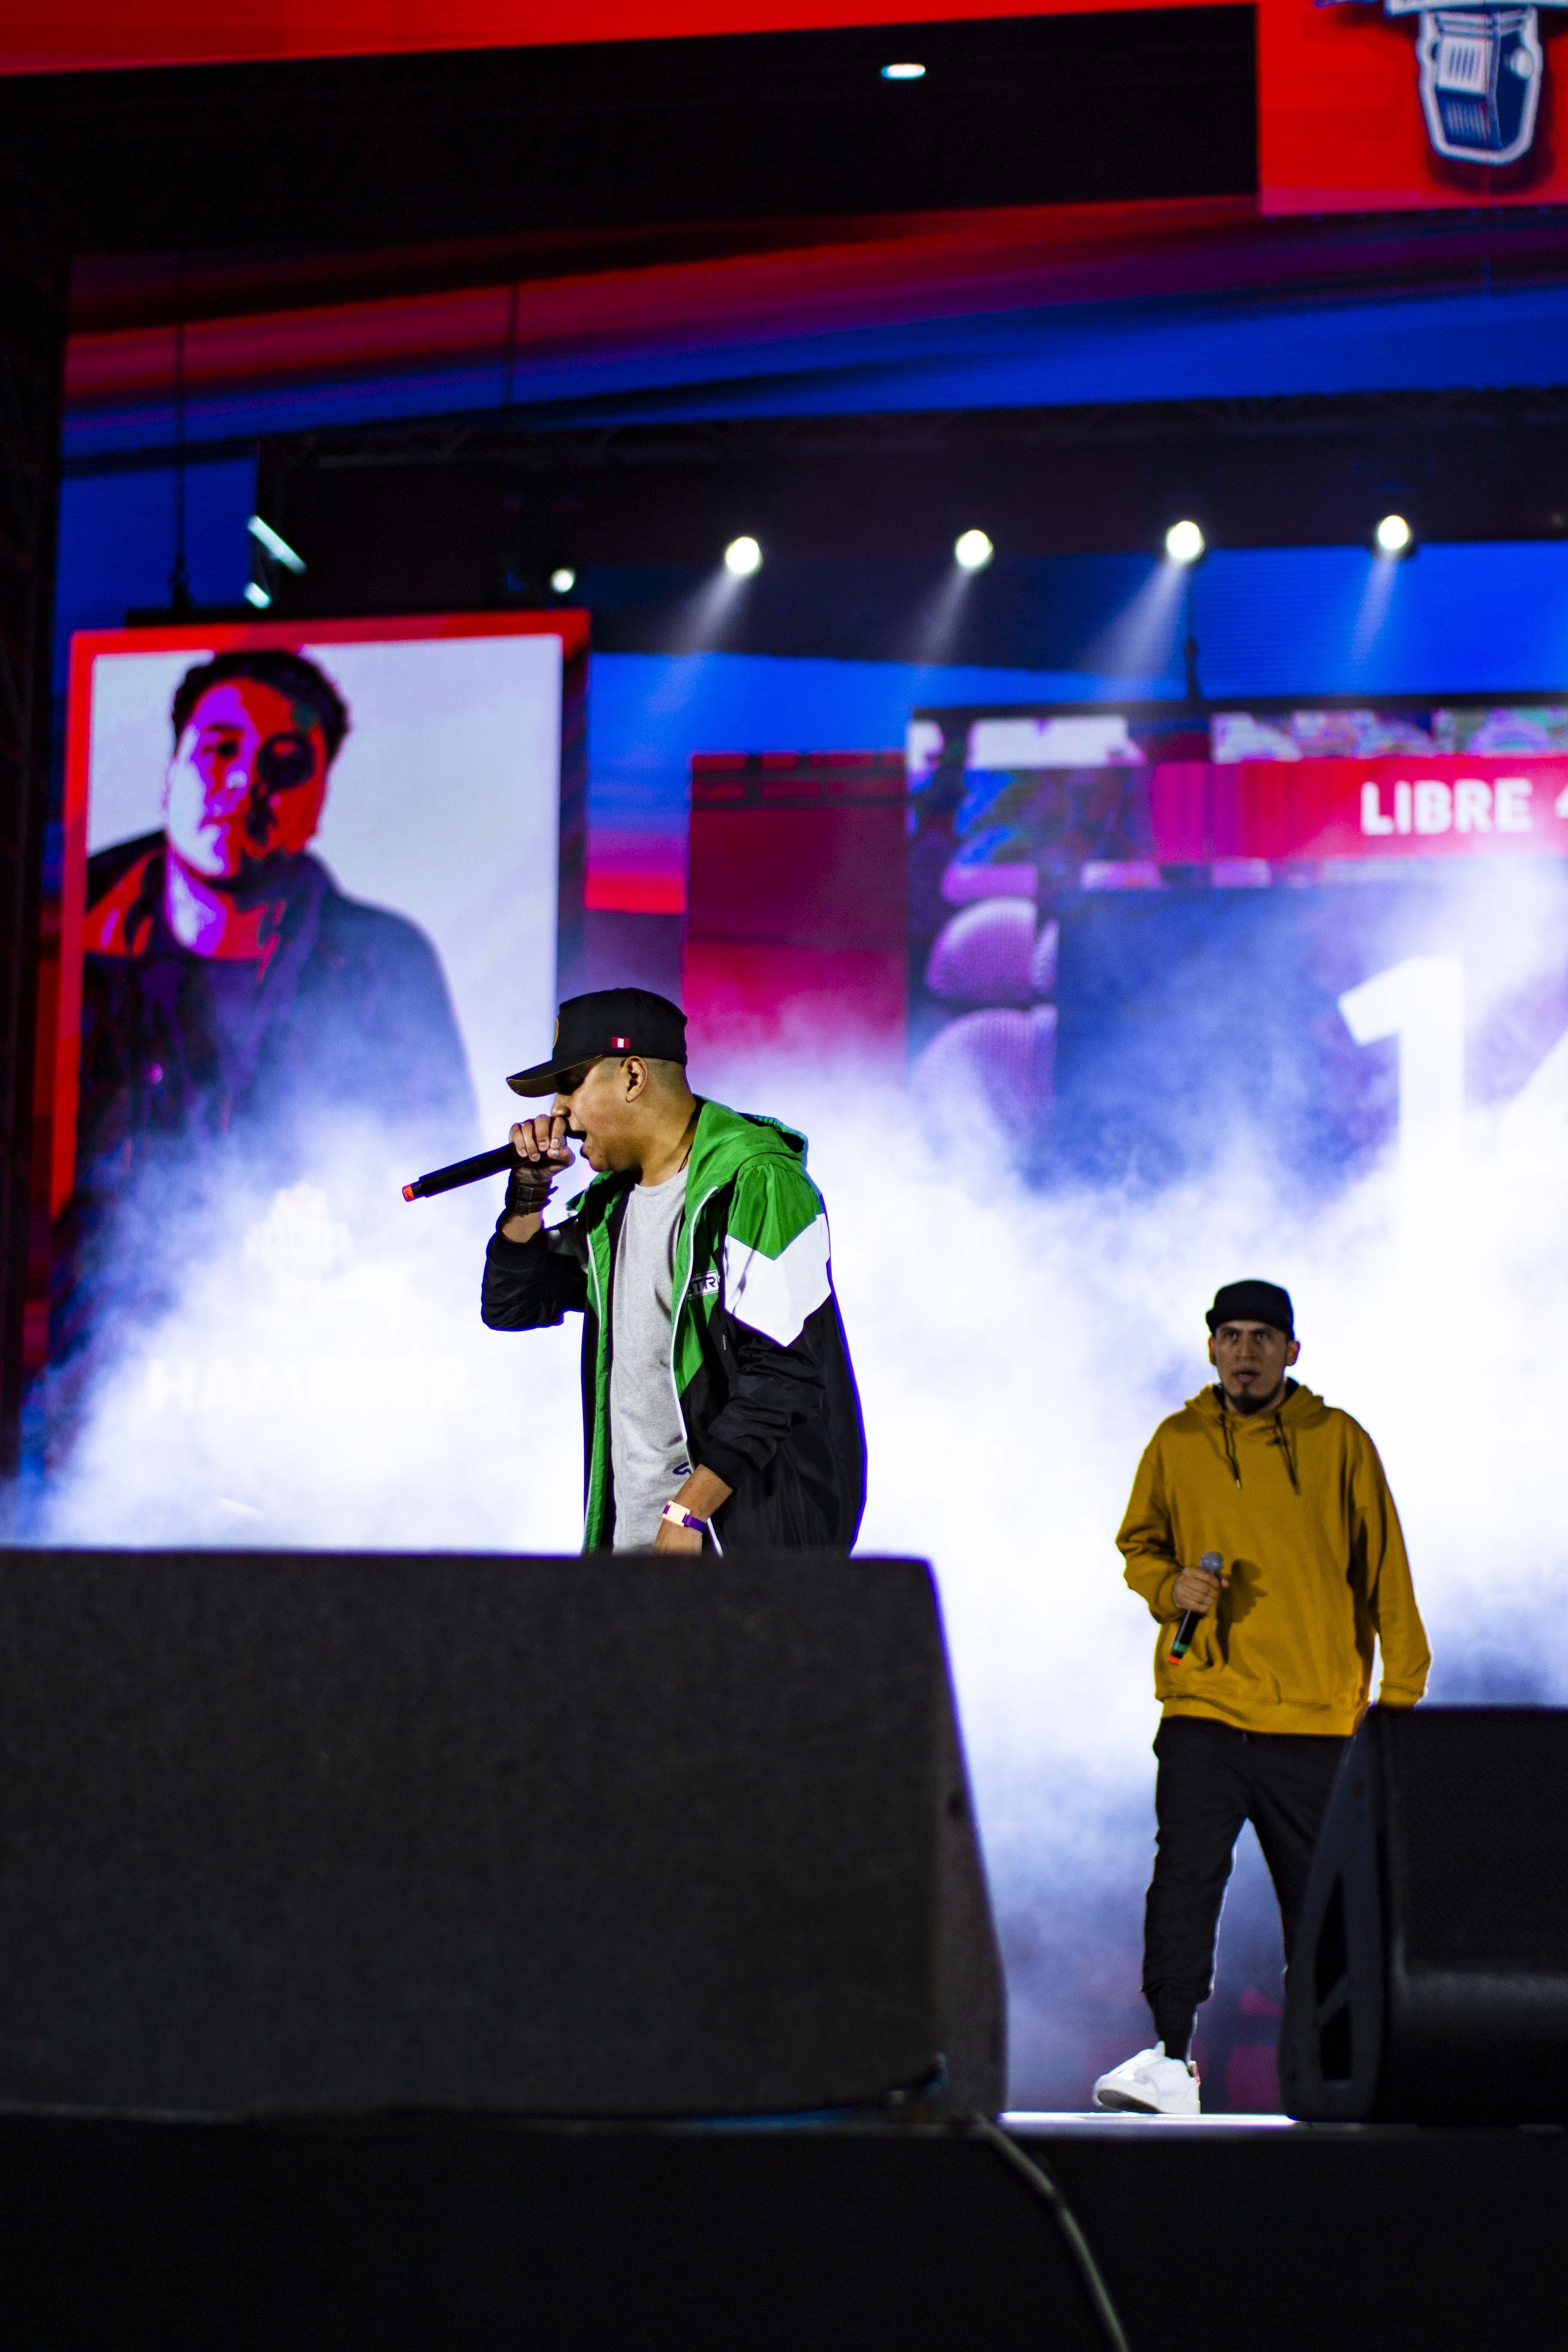 Fotógrafo : Juan Carlos Chavez - InNewsMusic.com